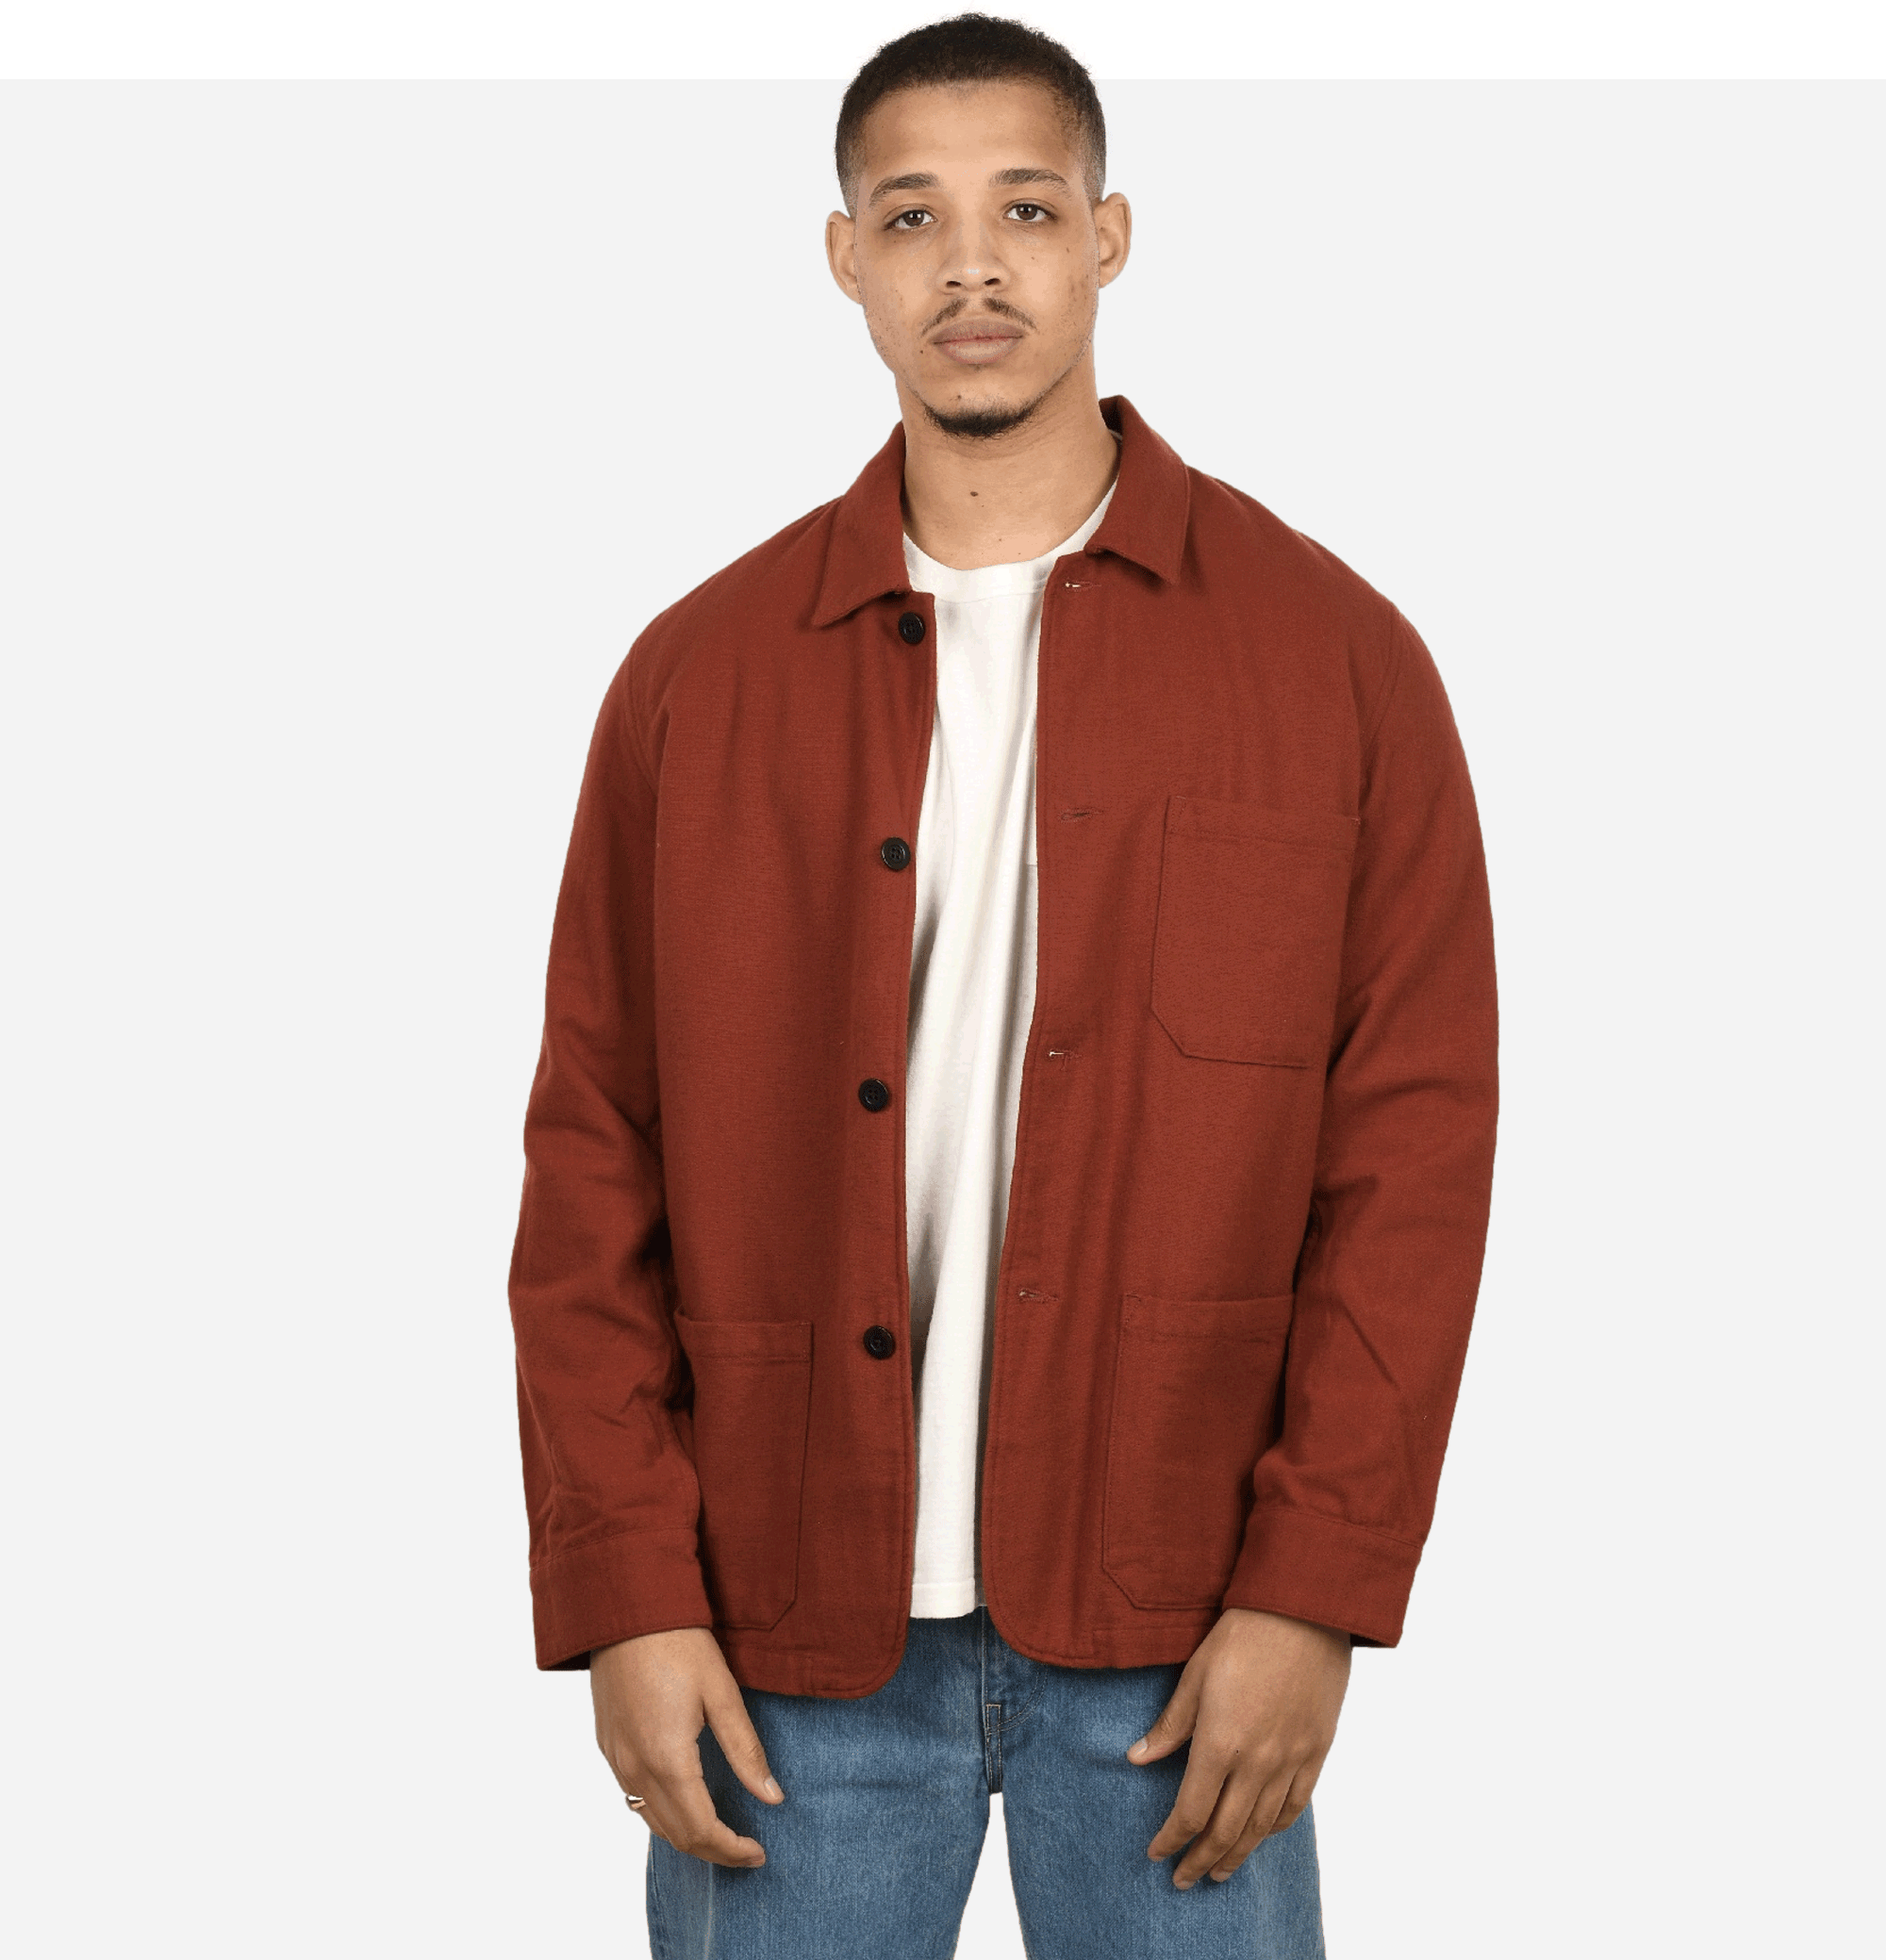 Labura Flannel Jacket Bordeaux